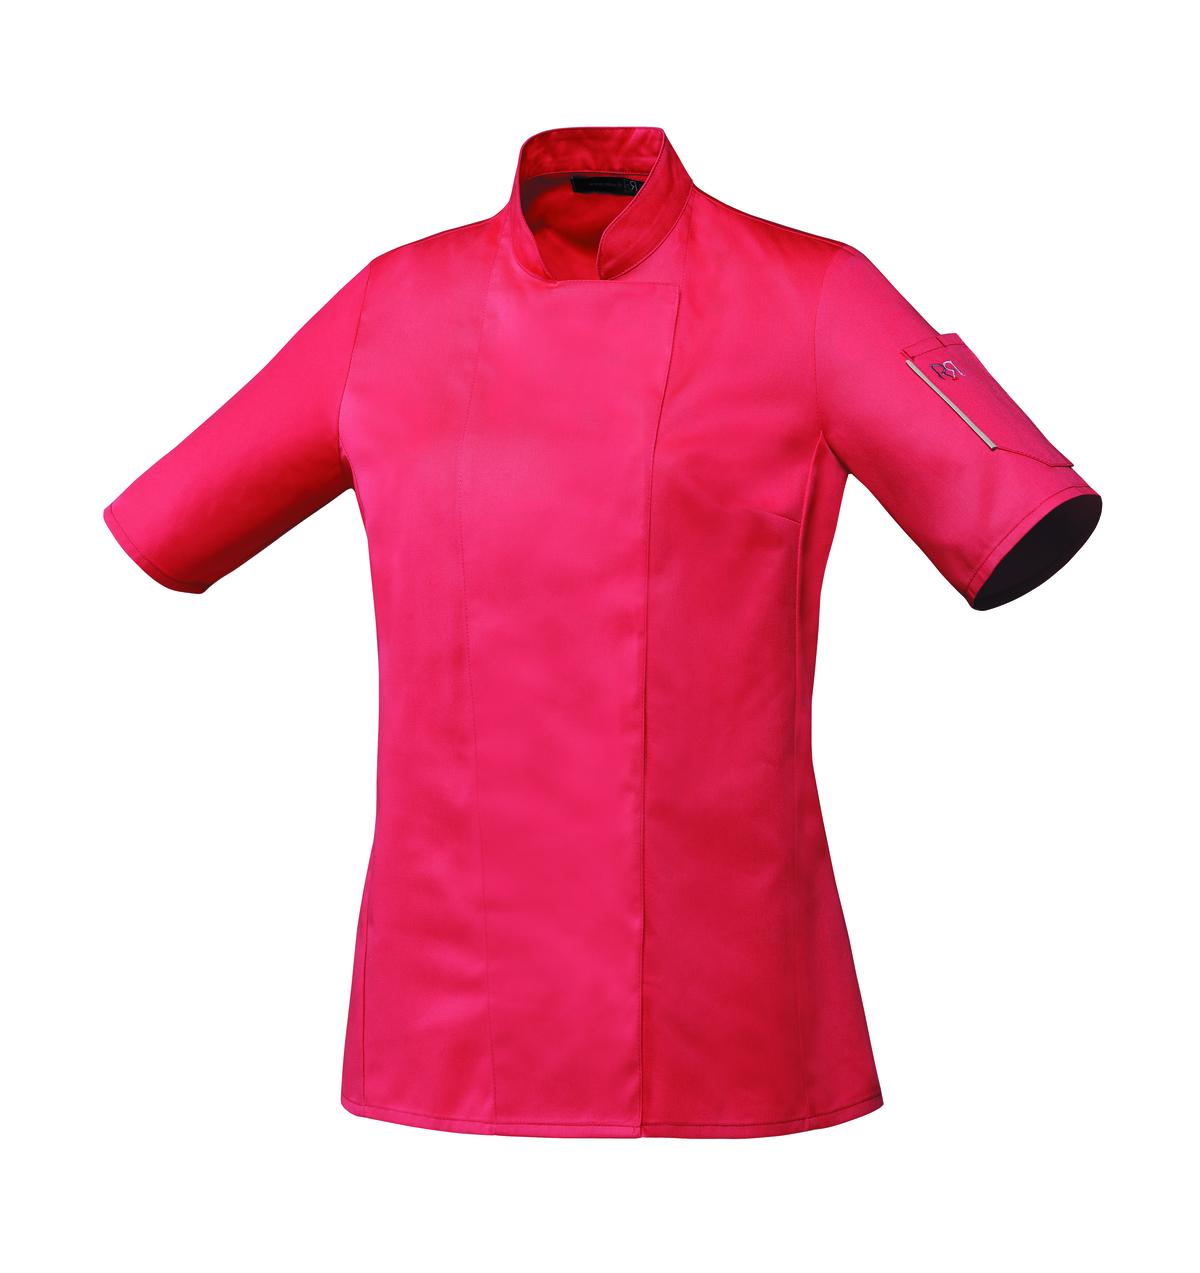 Veste femme rose taille 5 Unera Robur